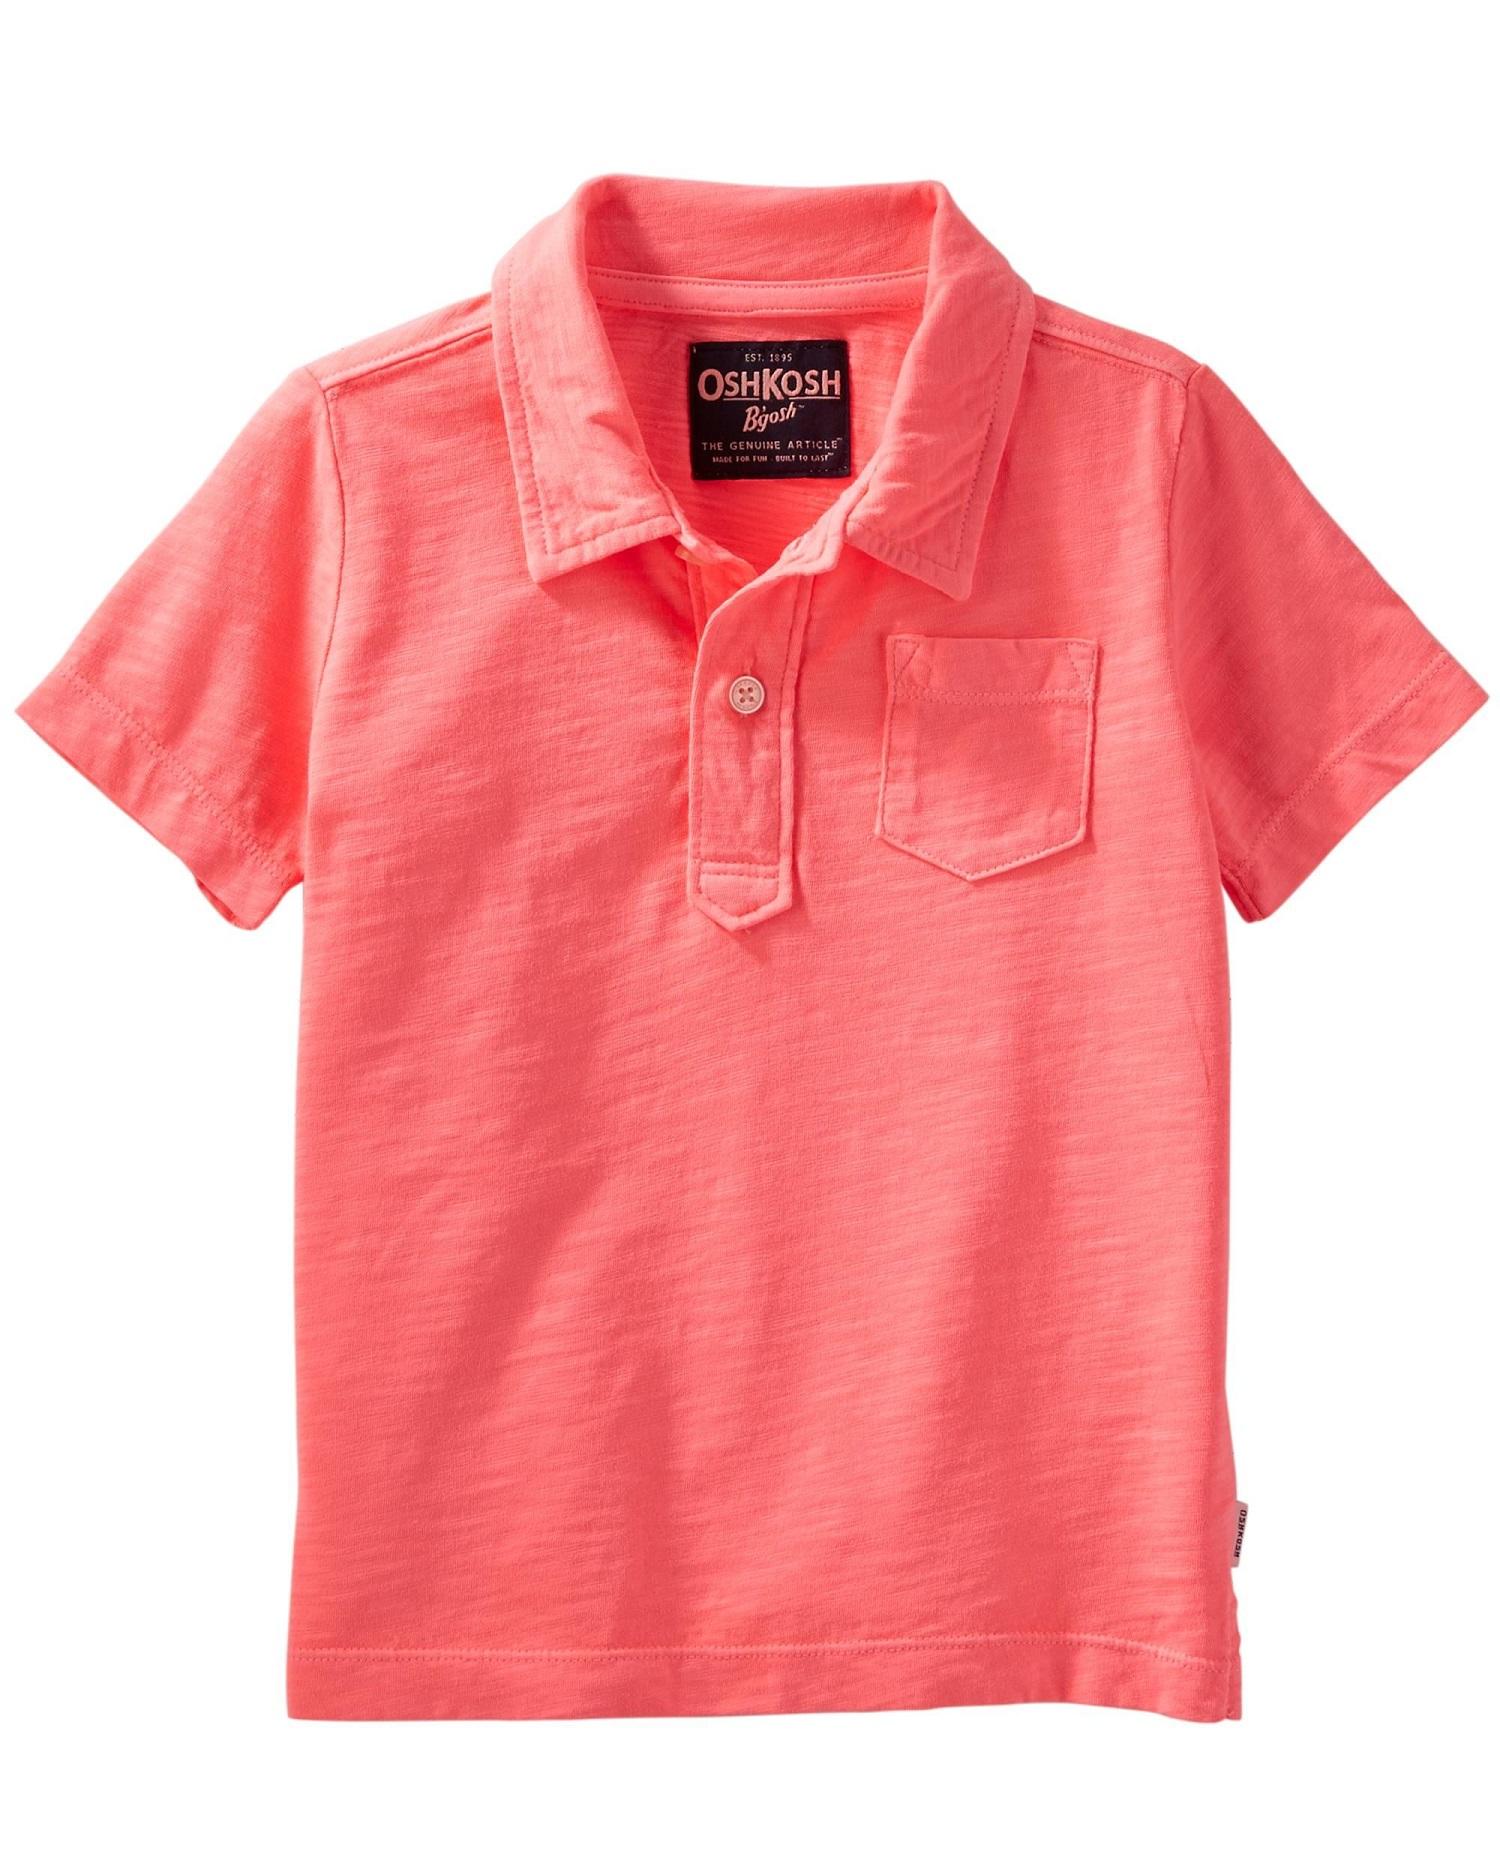 OshKosh B'gosh Little Boys' Neon Jersey Polo